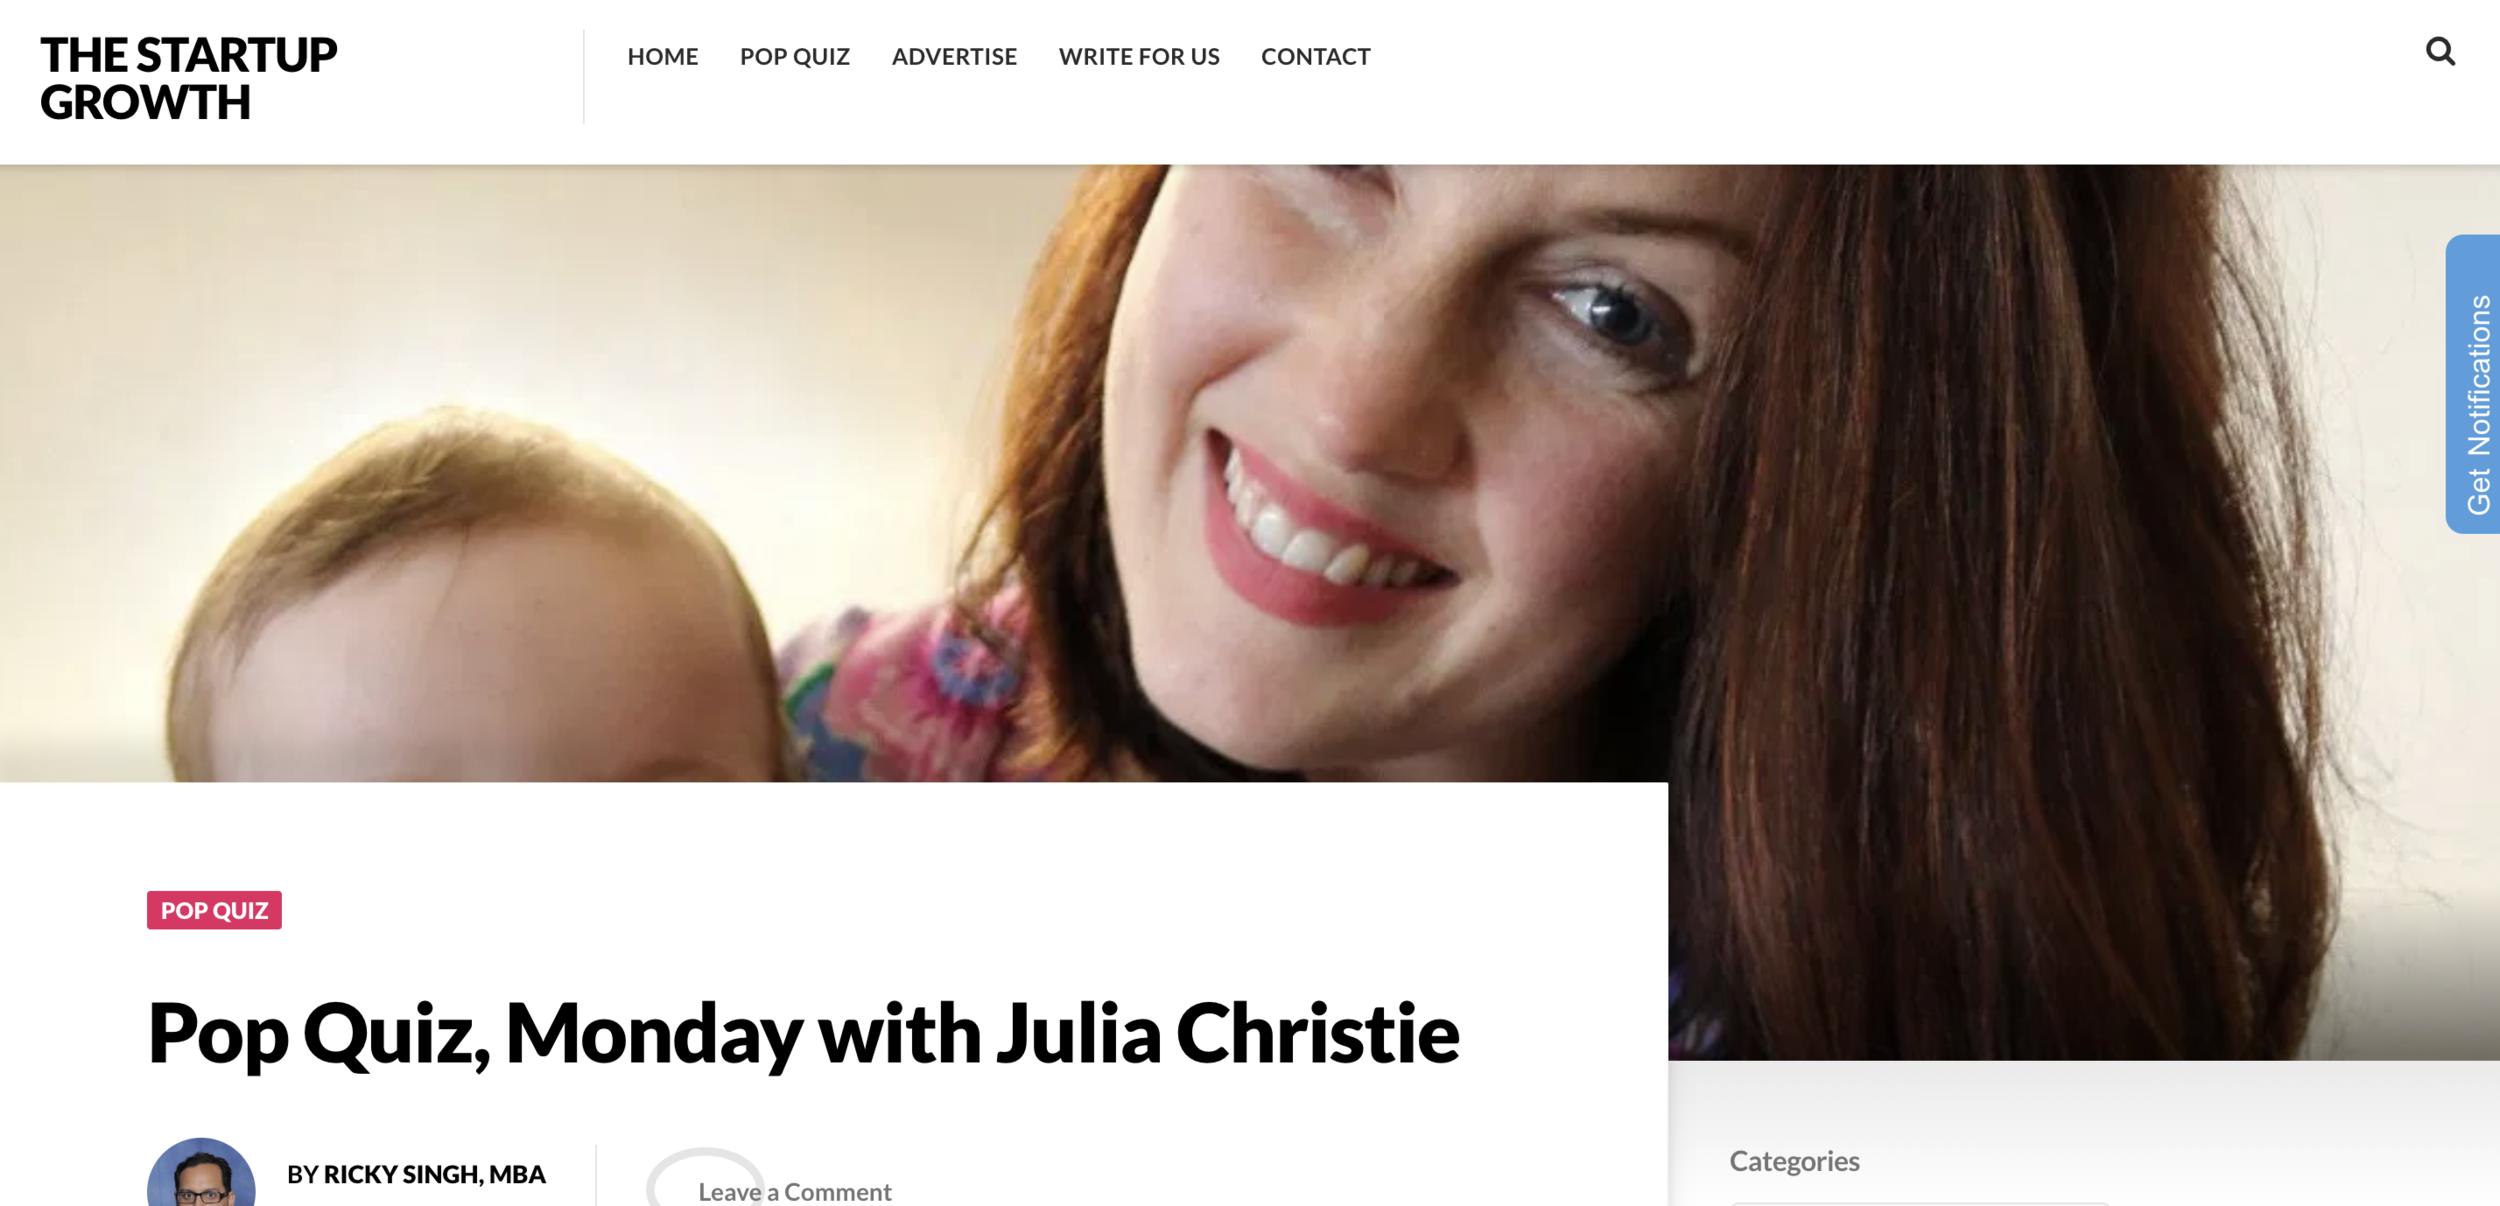 The Start Up Growth - Julia Christie